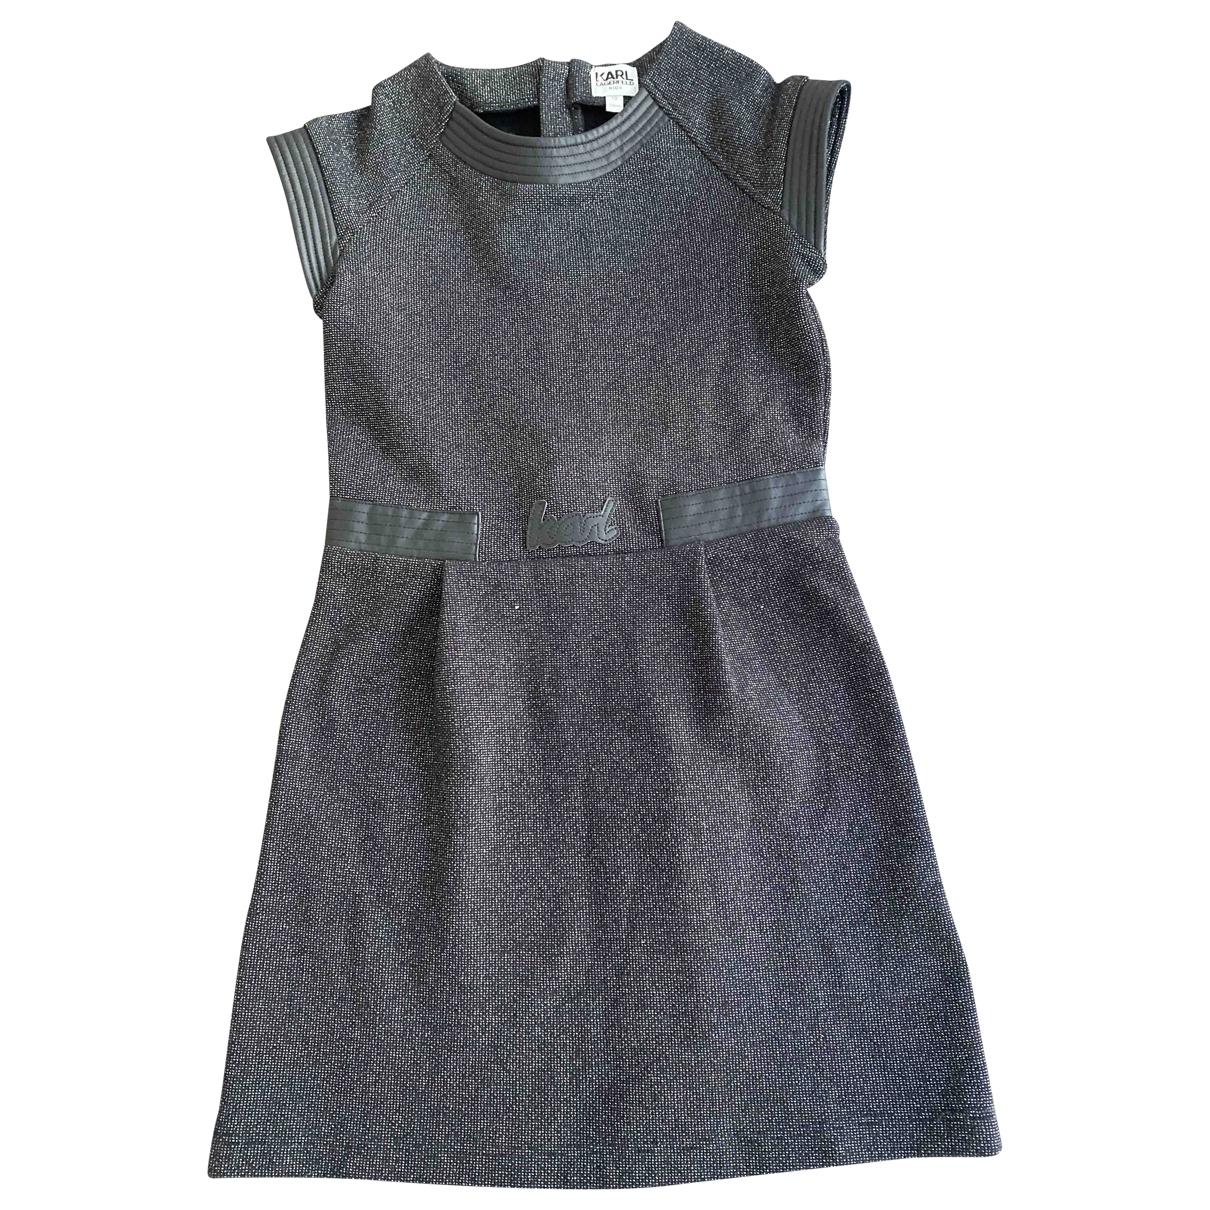 Karl Lagerfeld \N Kleid in  Schwarz Polyester